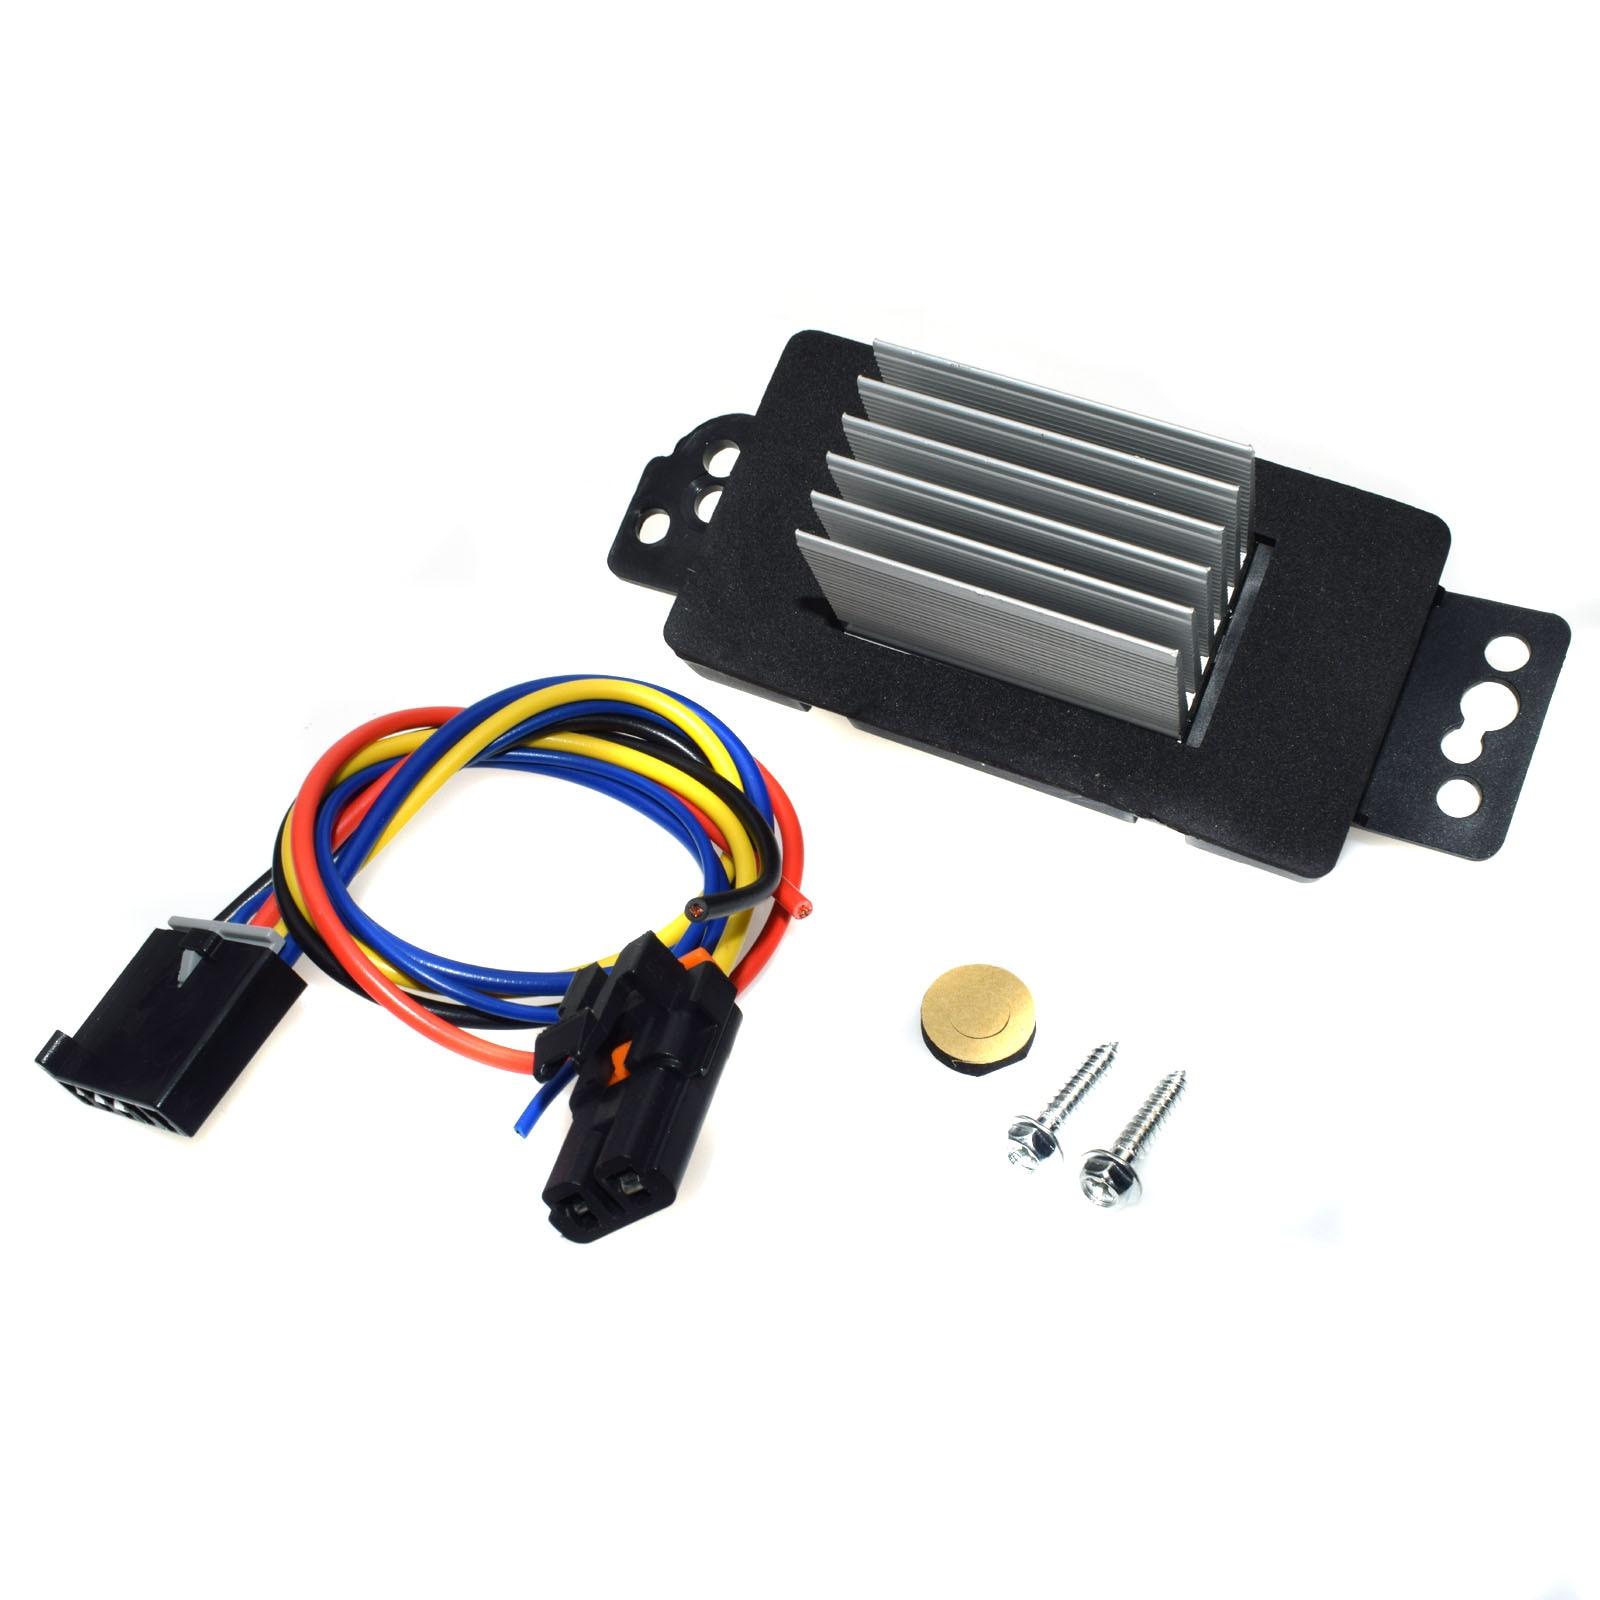 medium resolution of wolfigo new hvac blower motor resistor with plug harness 15850268 22754990 ru359 1580888 for pontiac chevrolet impala buick in blower motors from